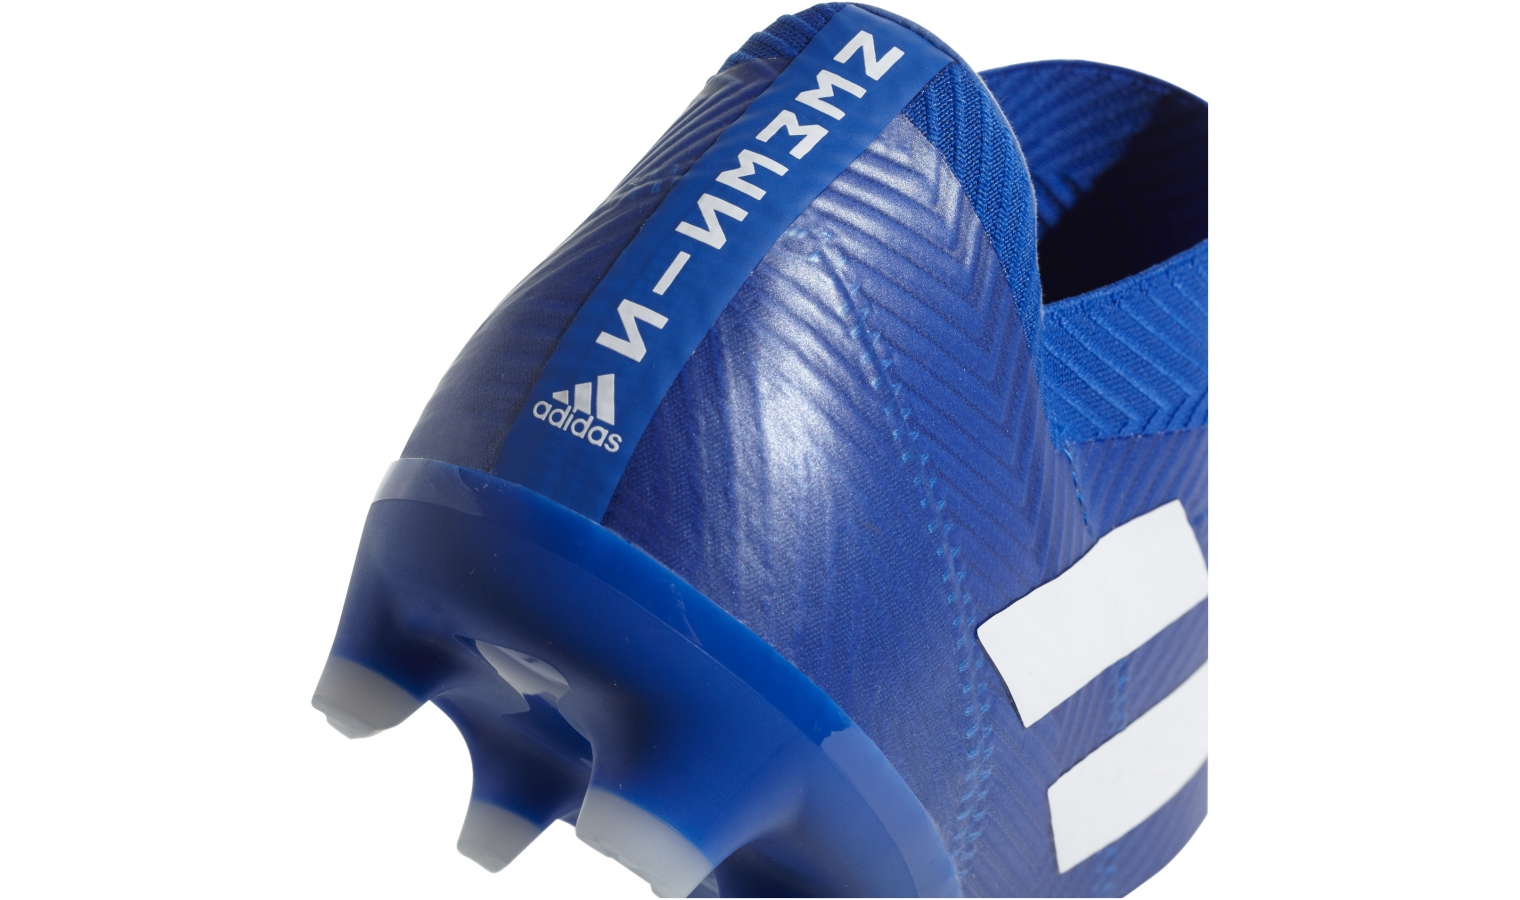 4eeaec48446ec ... Kopačky lisovky adidas NEMEZIZ 18.2 FG modré. 0 EUR Zľava